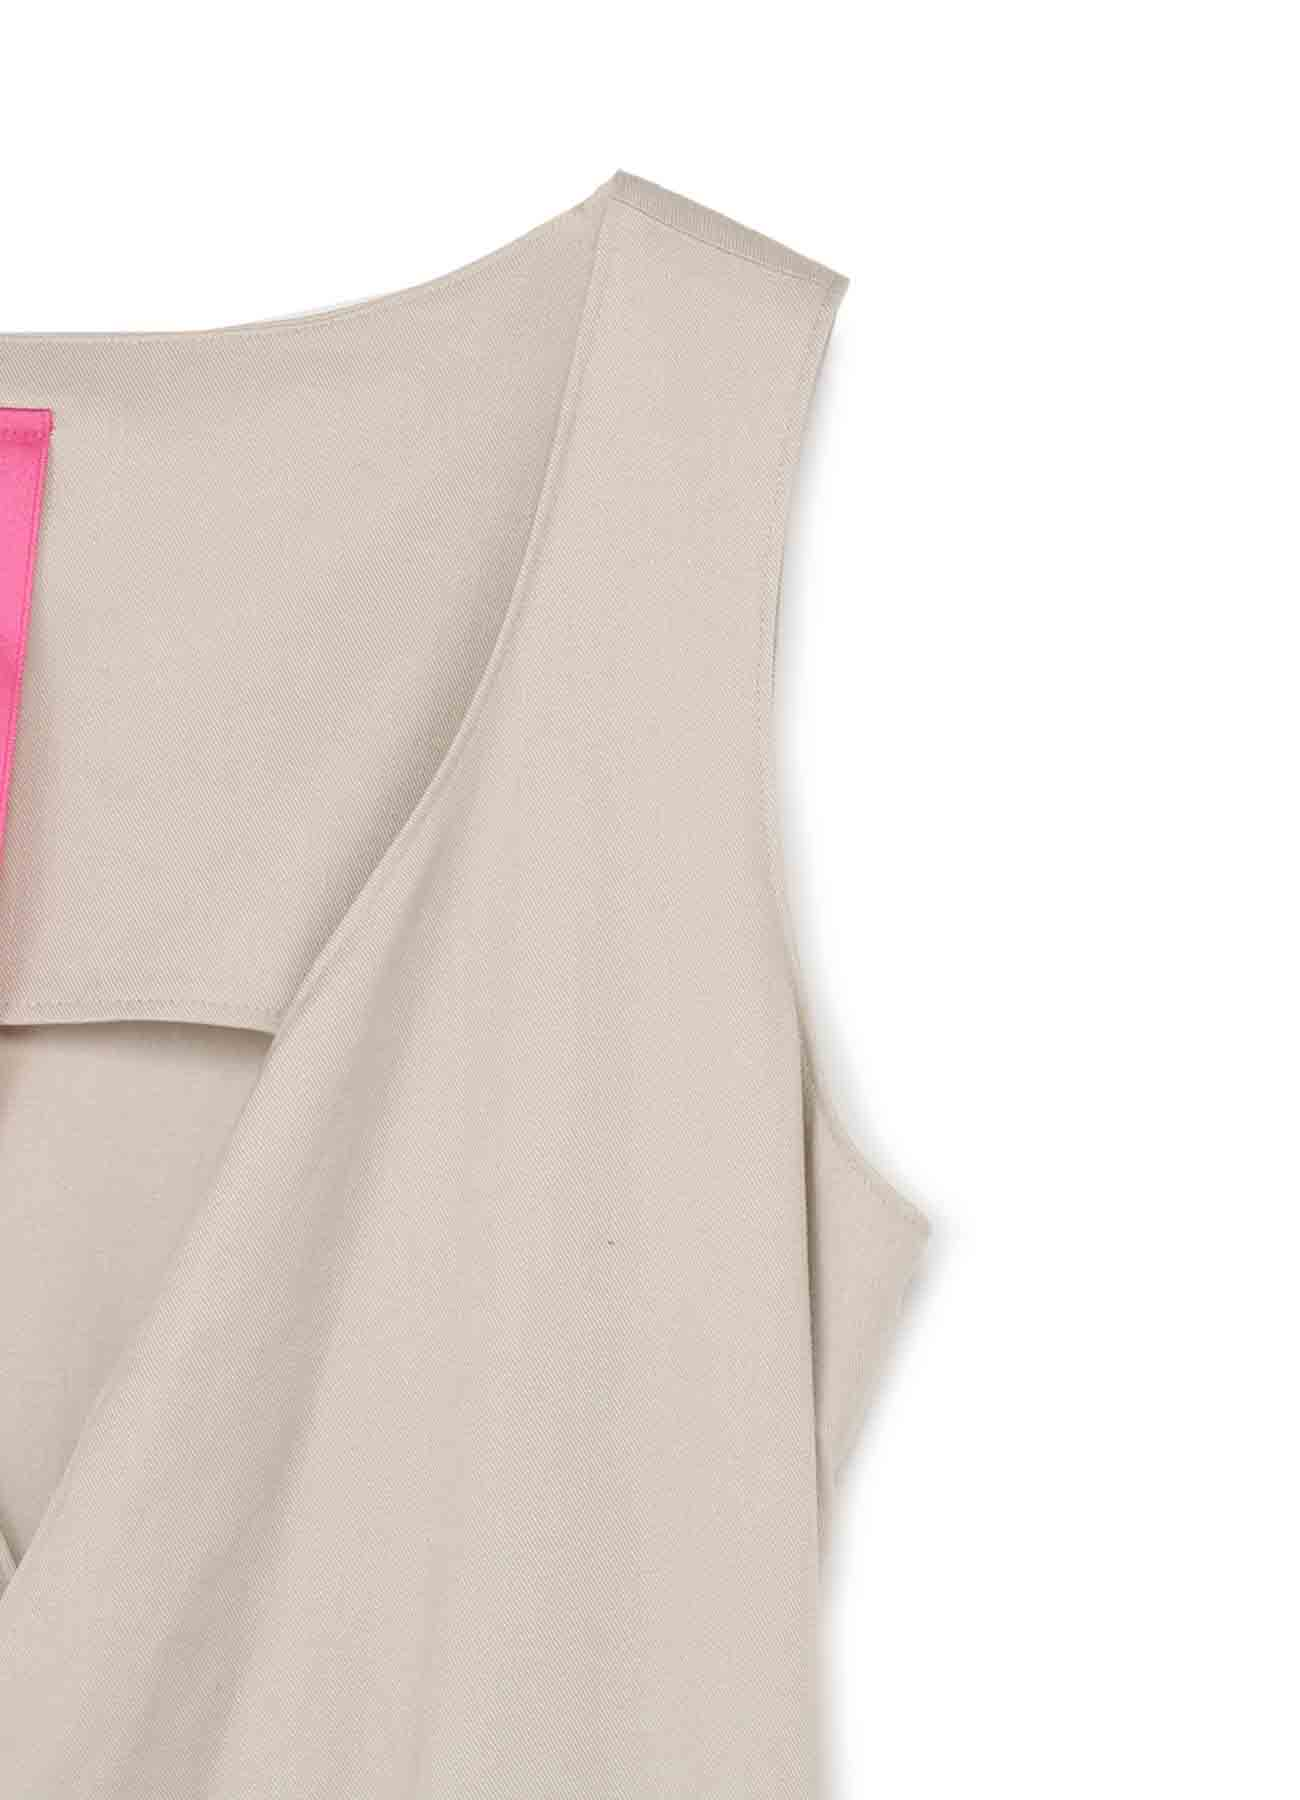 Ry LINE TWILL SOFT TUMBLER CACHE COEUR DRESS